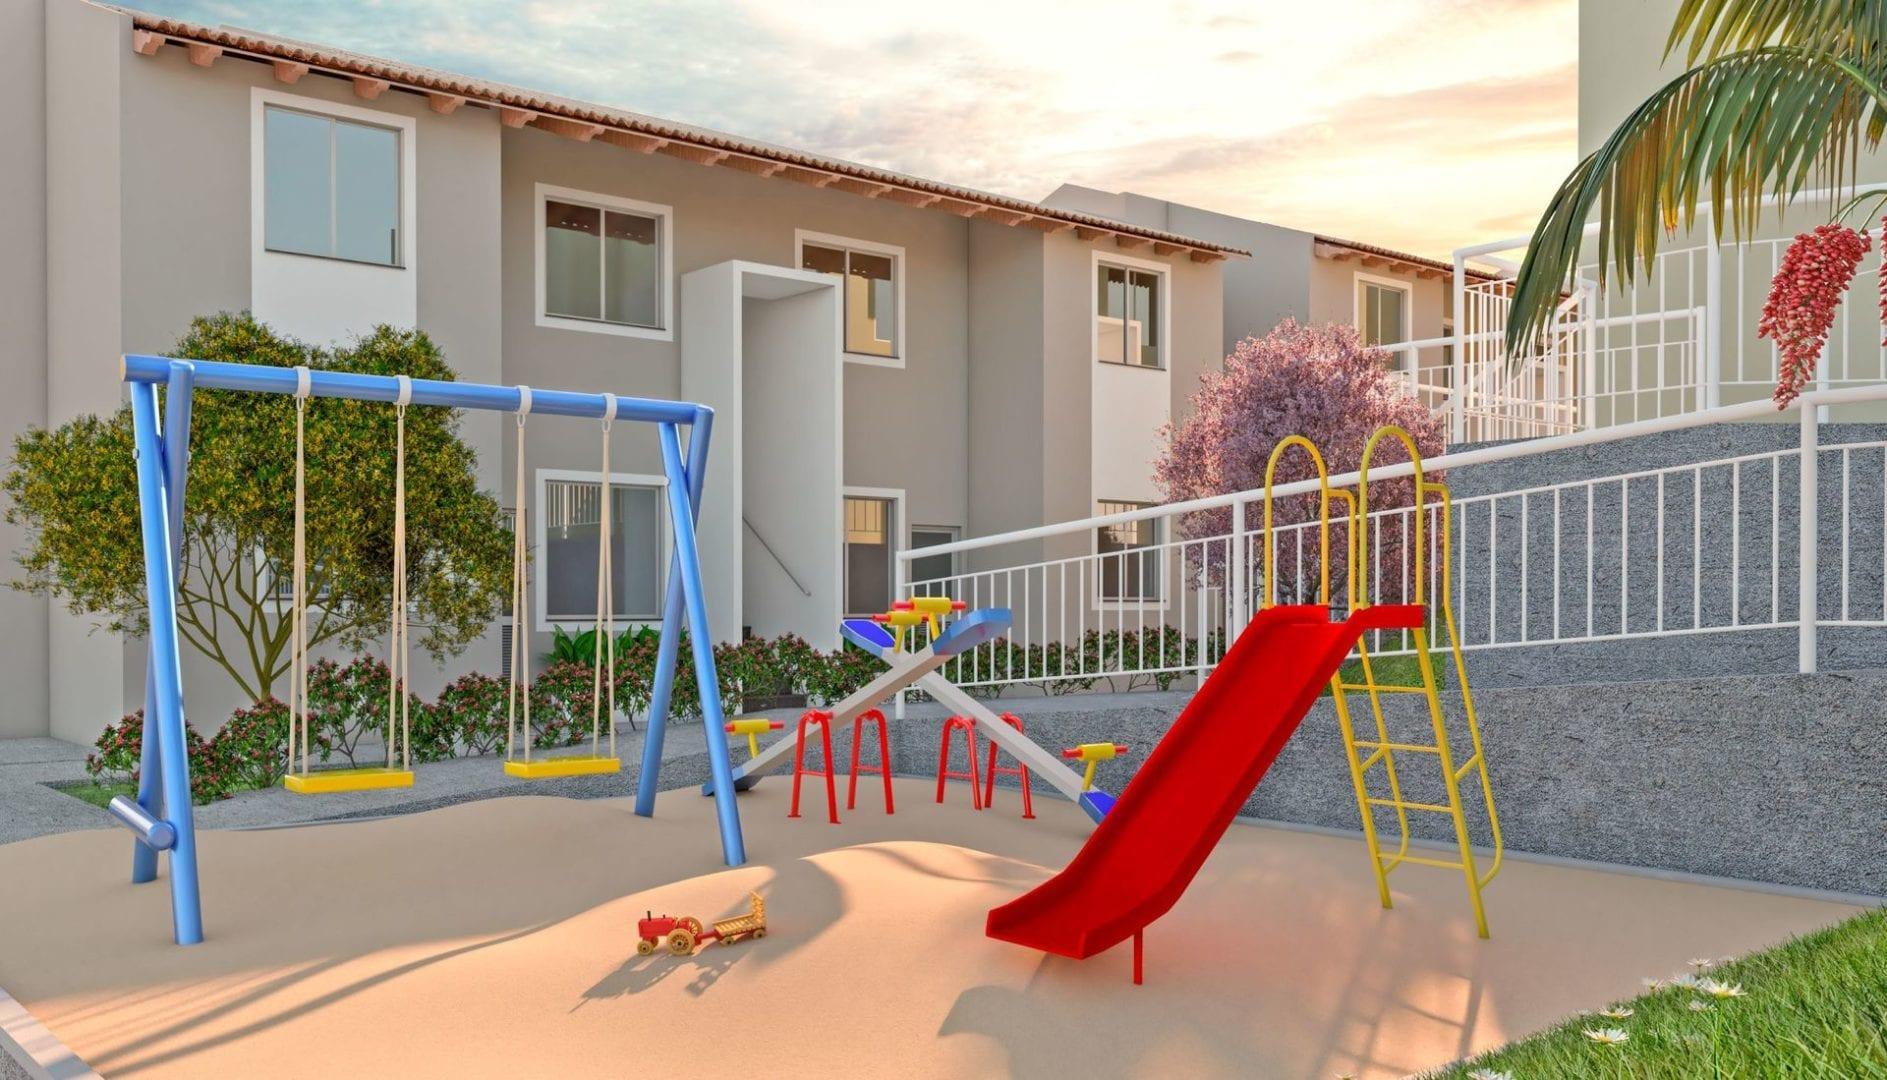 vic-engenharia-villa-bella-turim-playground